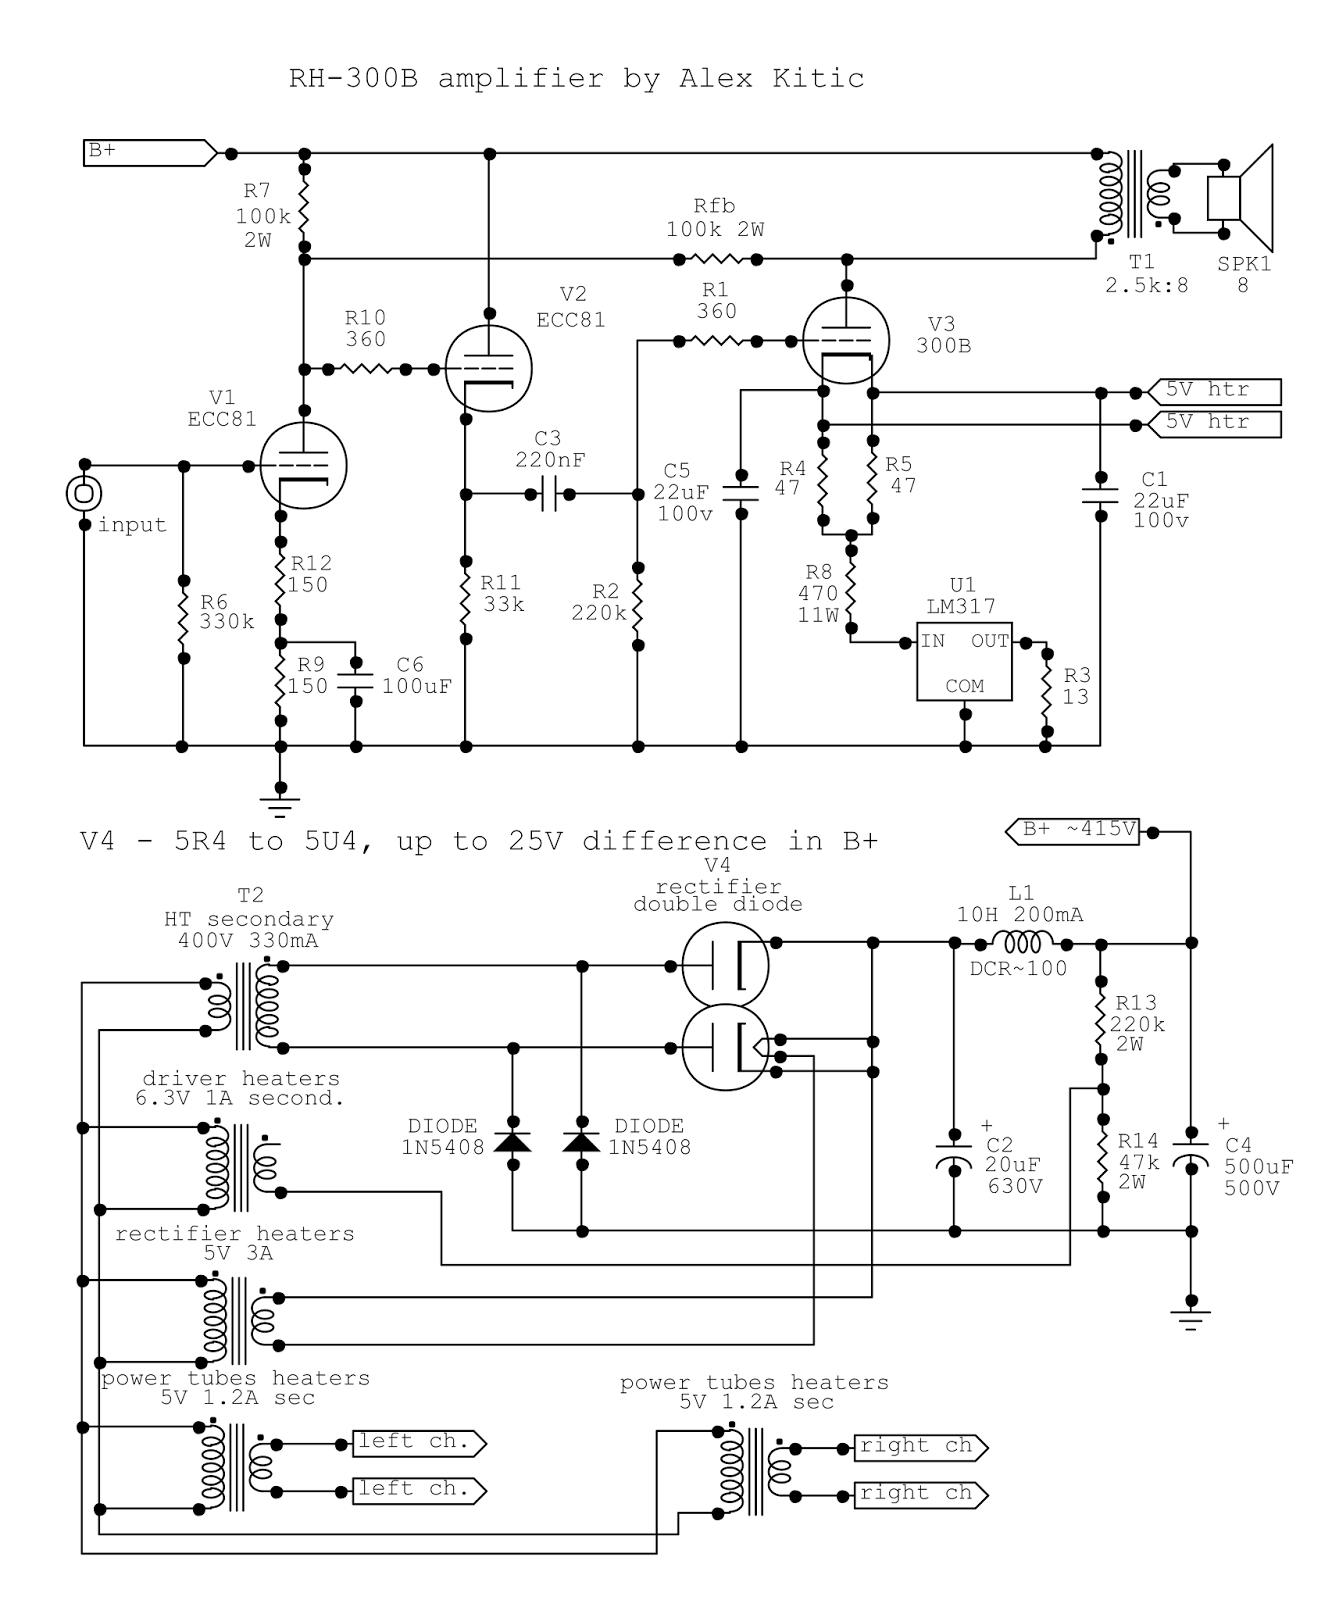 rh amplifiers the rh300b story rh rh amps blogspot com